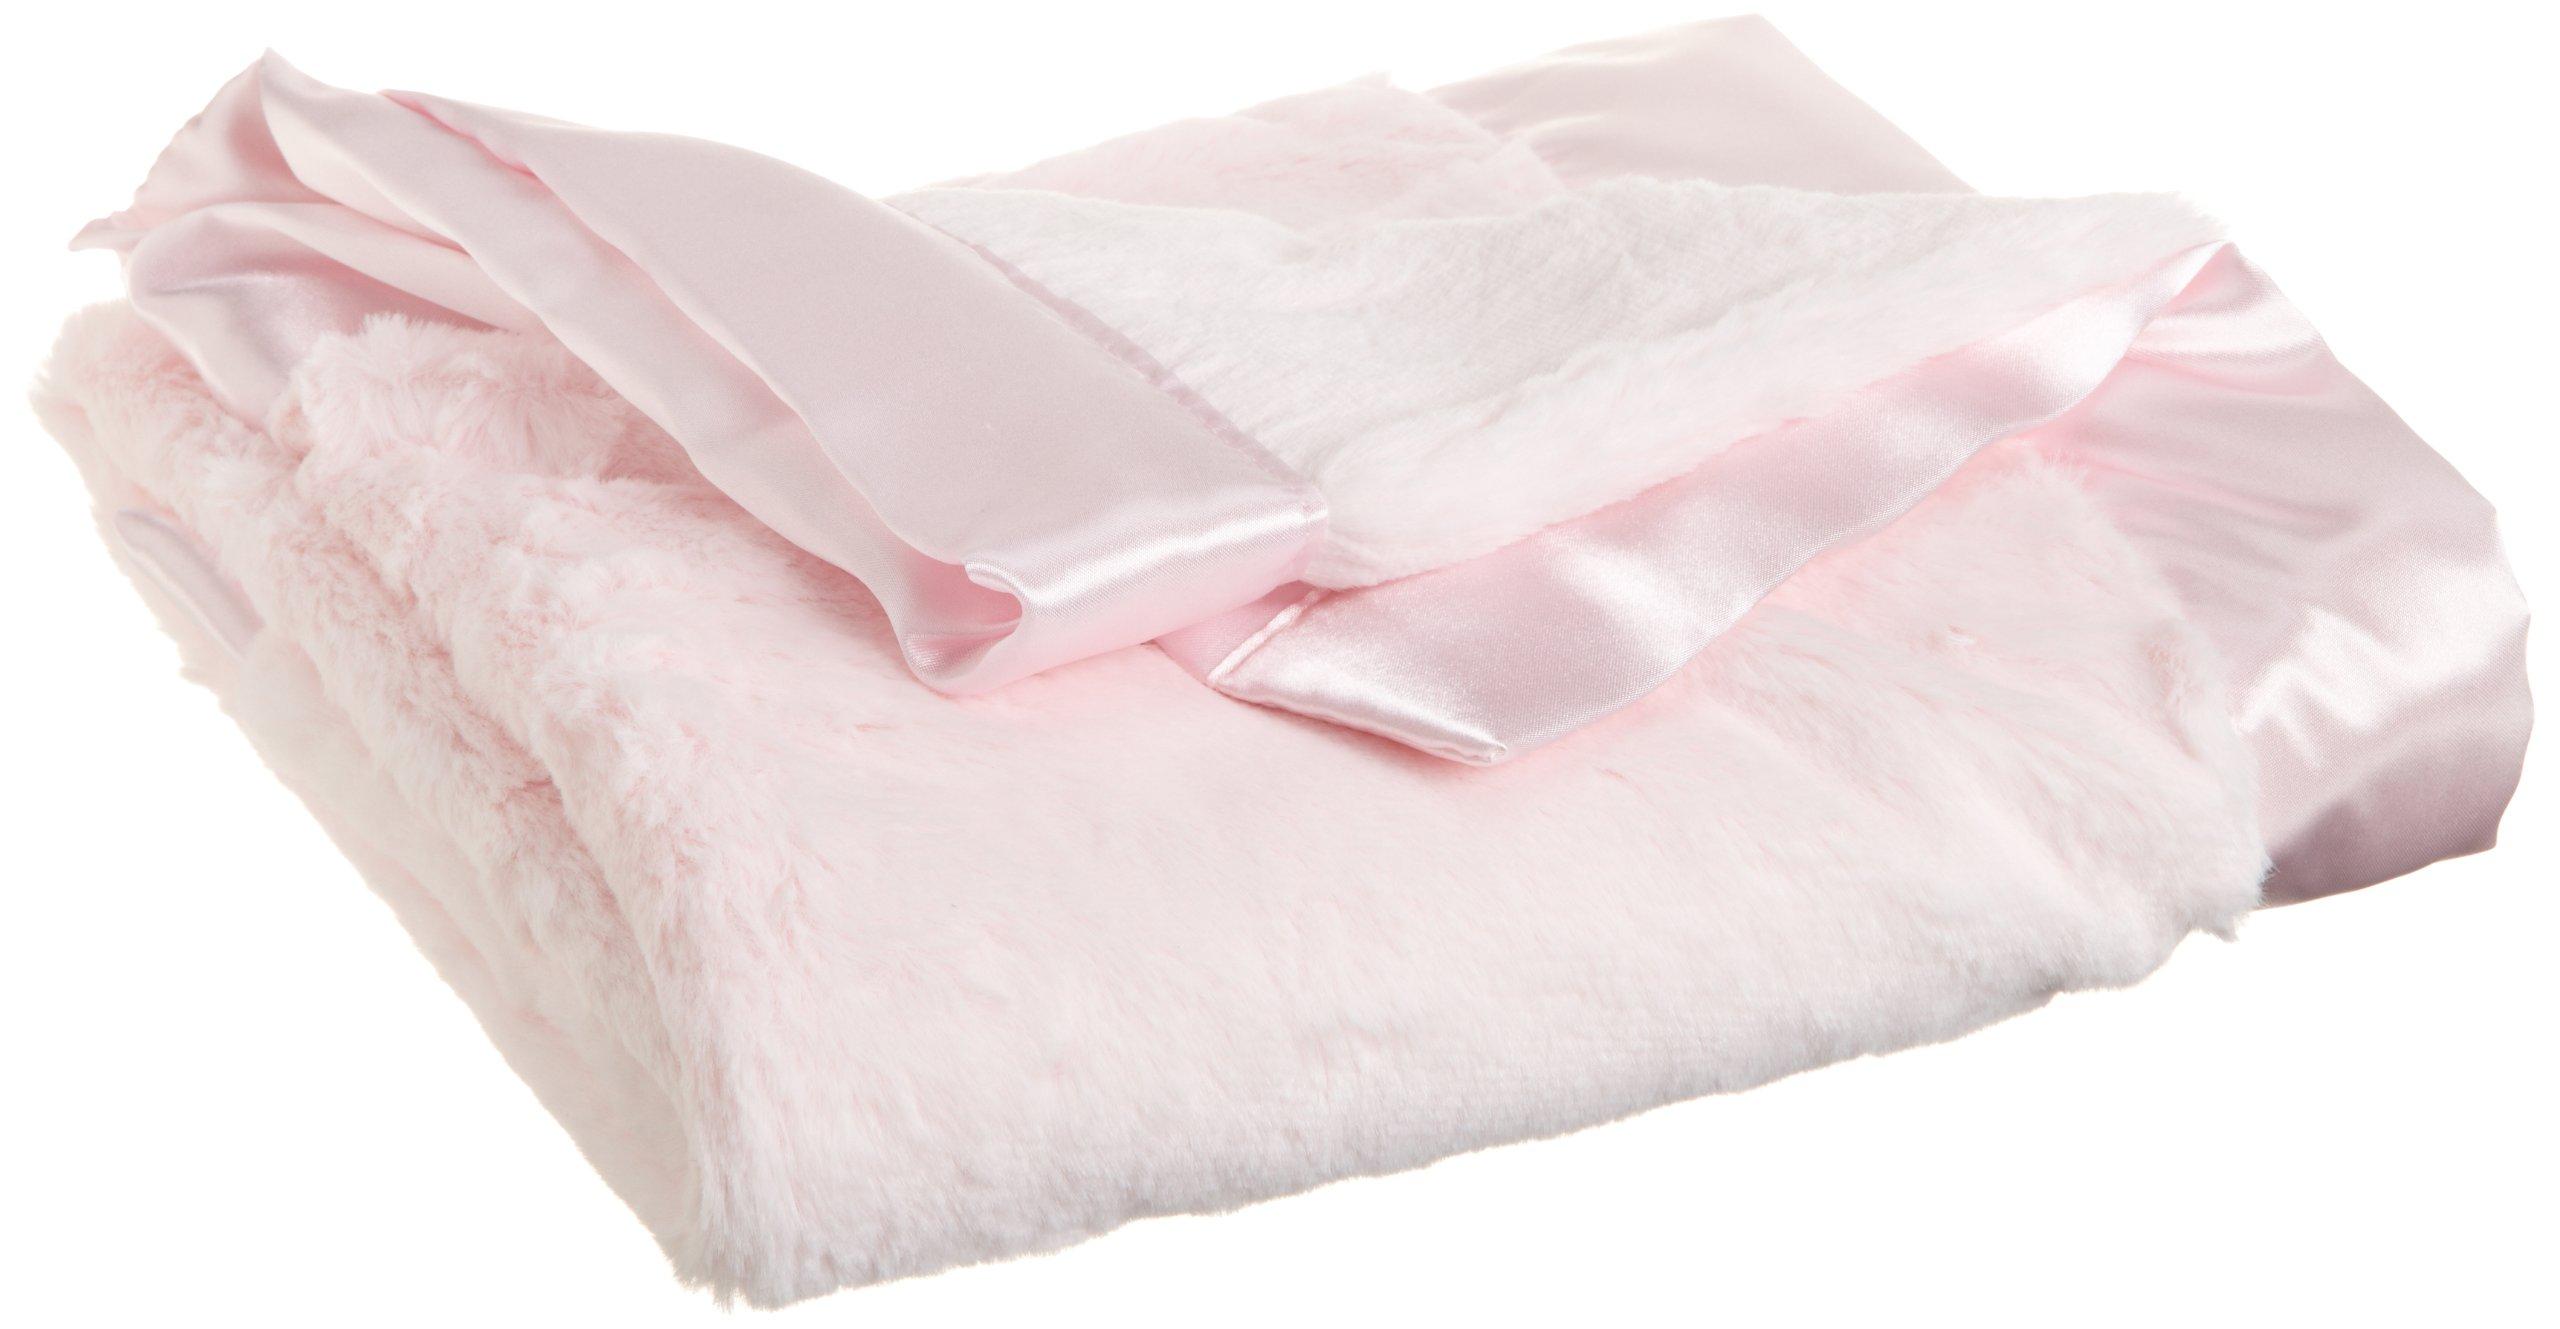 Little Me Baby-Girls Newborn Plush Stroller Blanket, Light Pink, One Size by Little Me